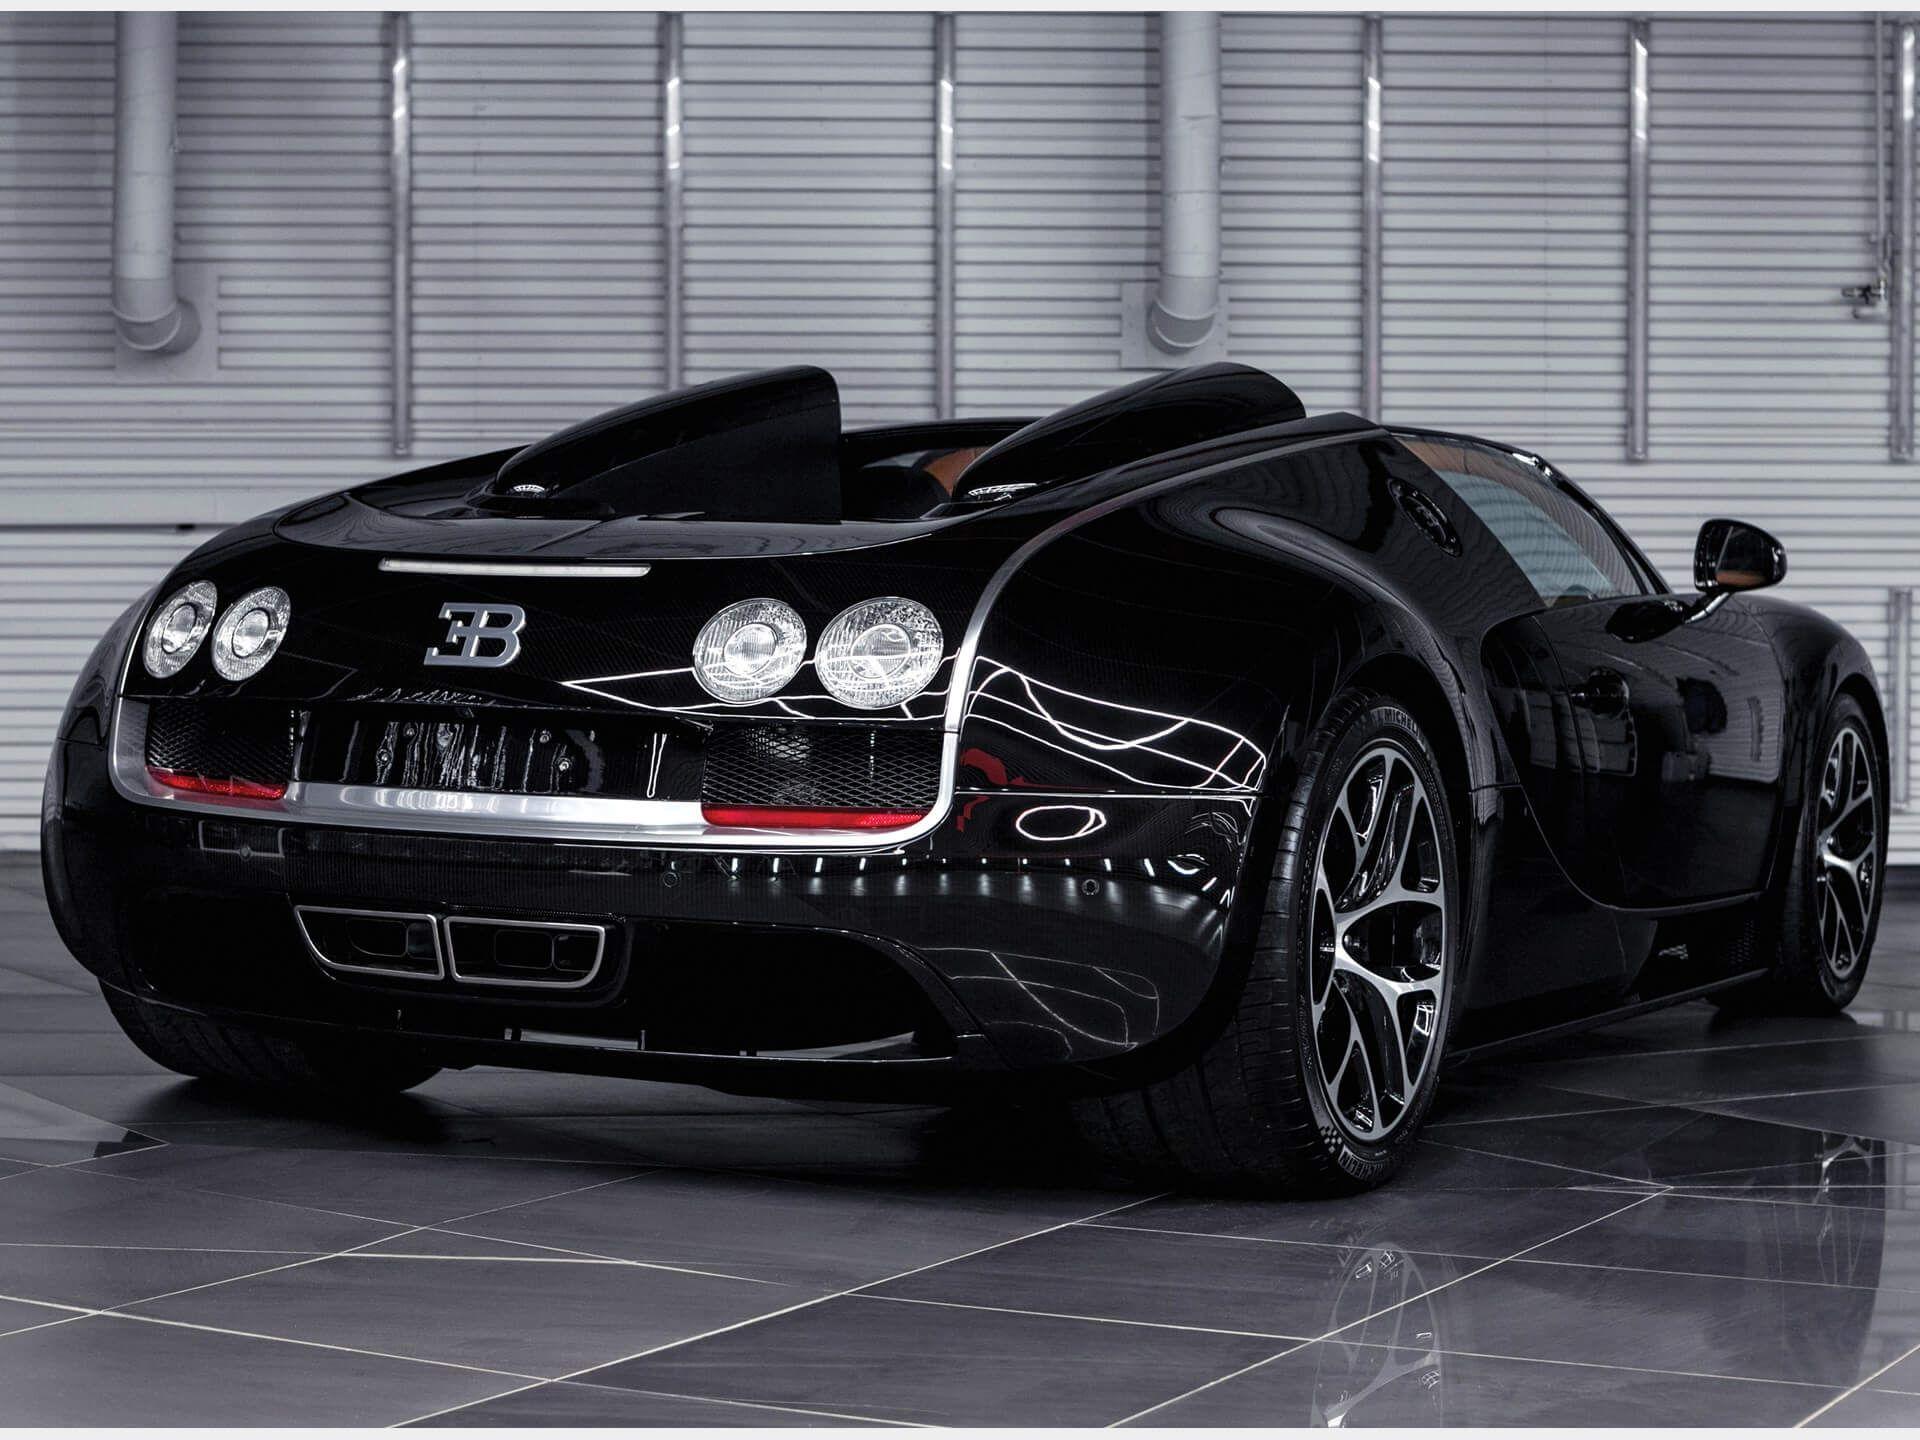 Bugatti Veyron 16 4 Grand Sport Vitesse Bugatti Veyron 16